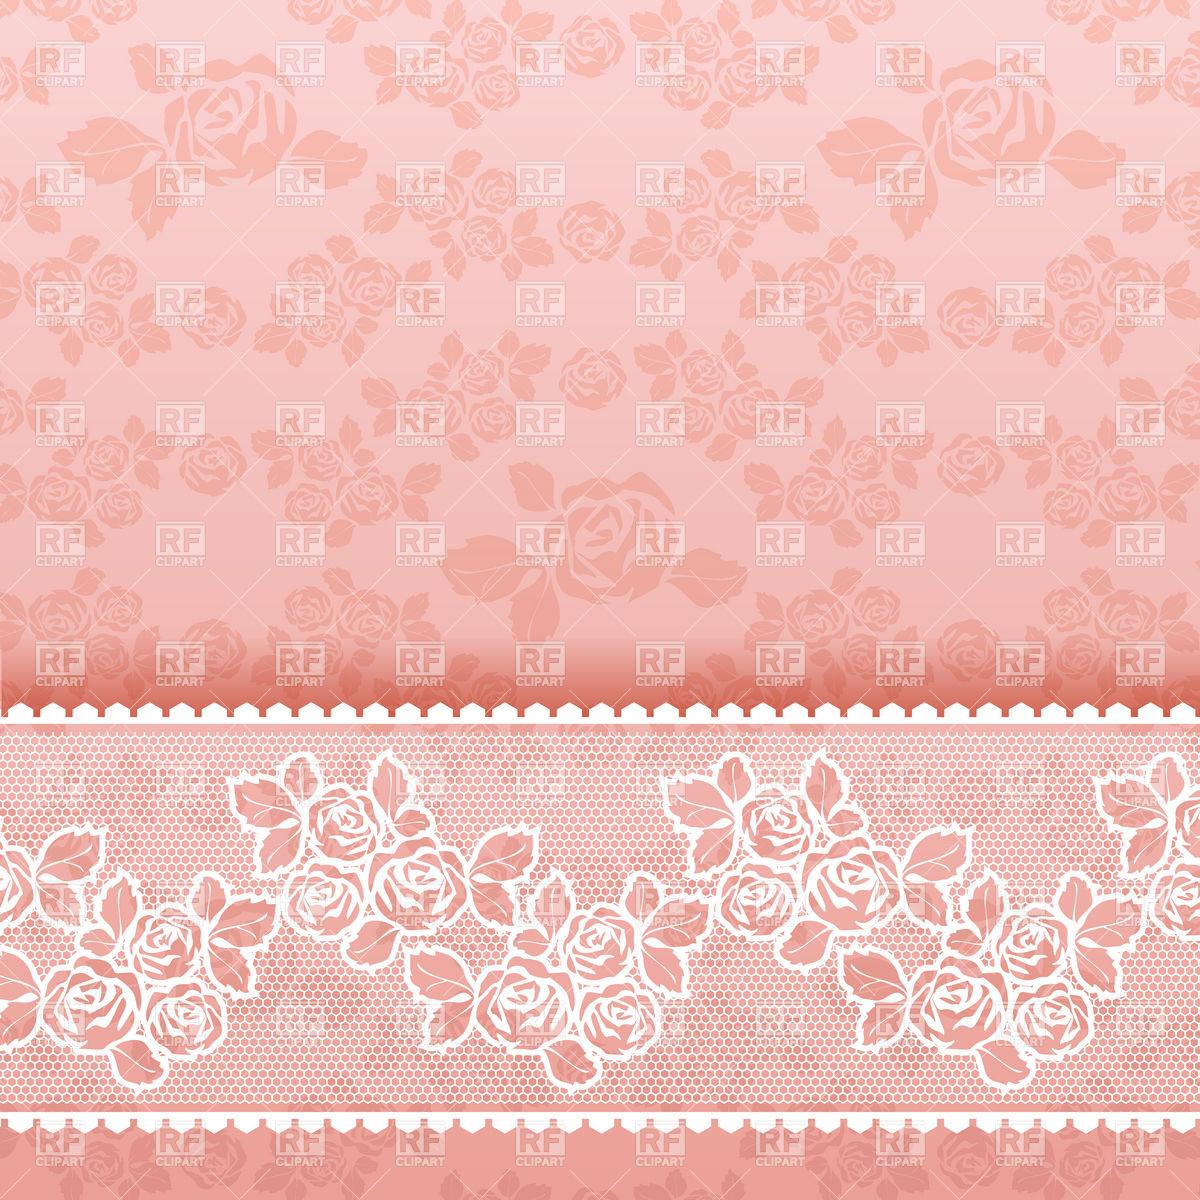 Wallpaper clipart pink Pink Wallpaper Resolution WallpaperHDC Vintage